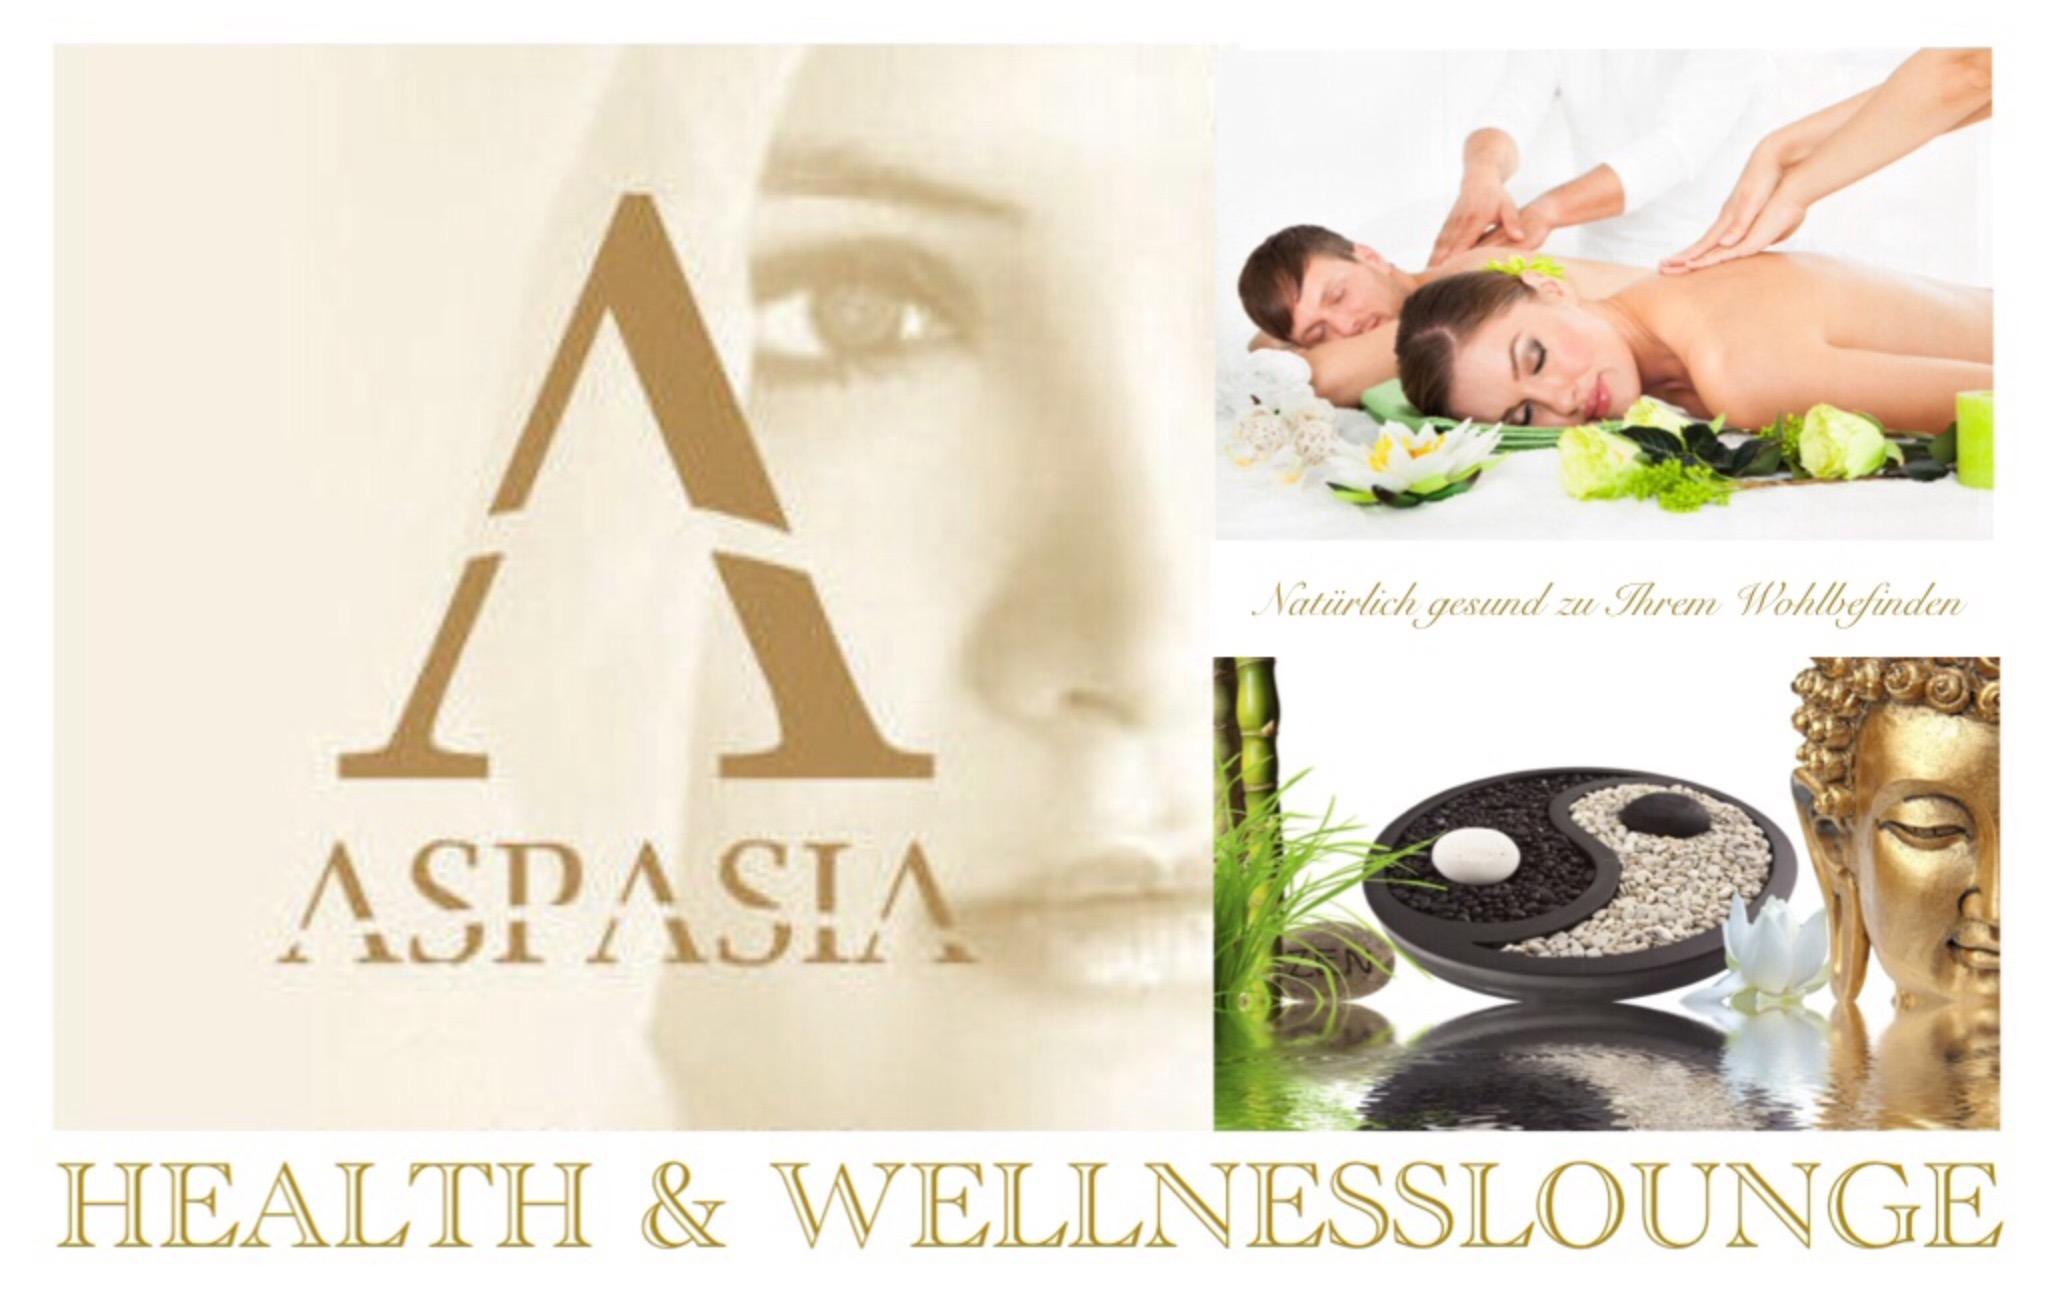 ASPASIA - WELLNESSLOUNGE